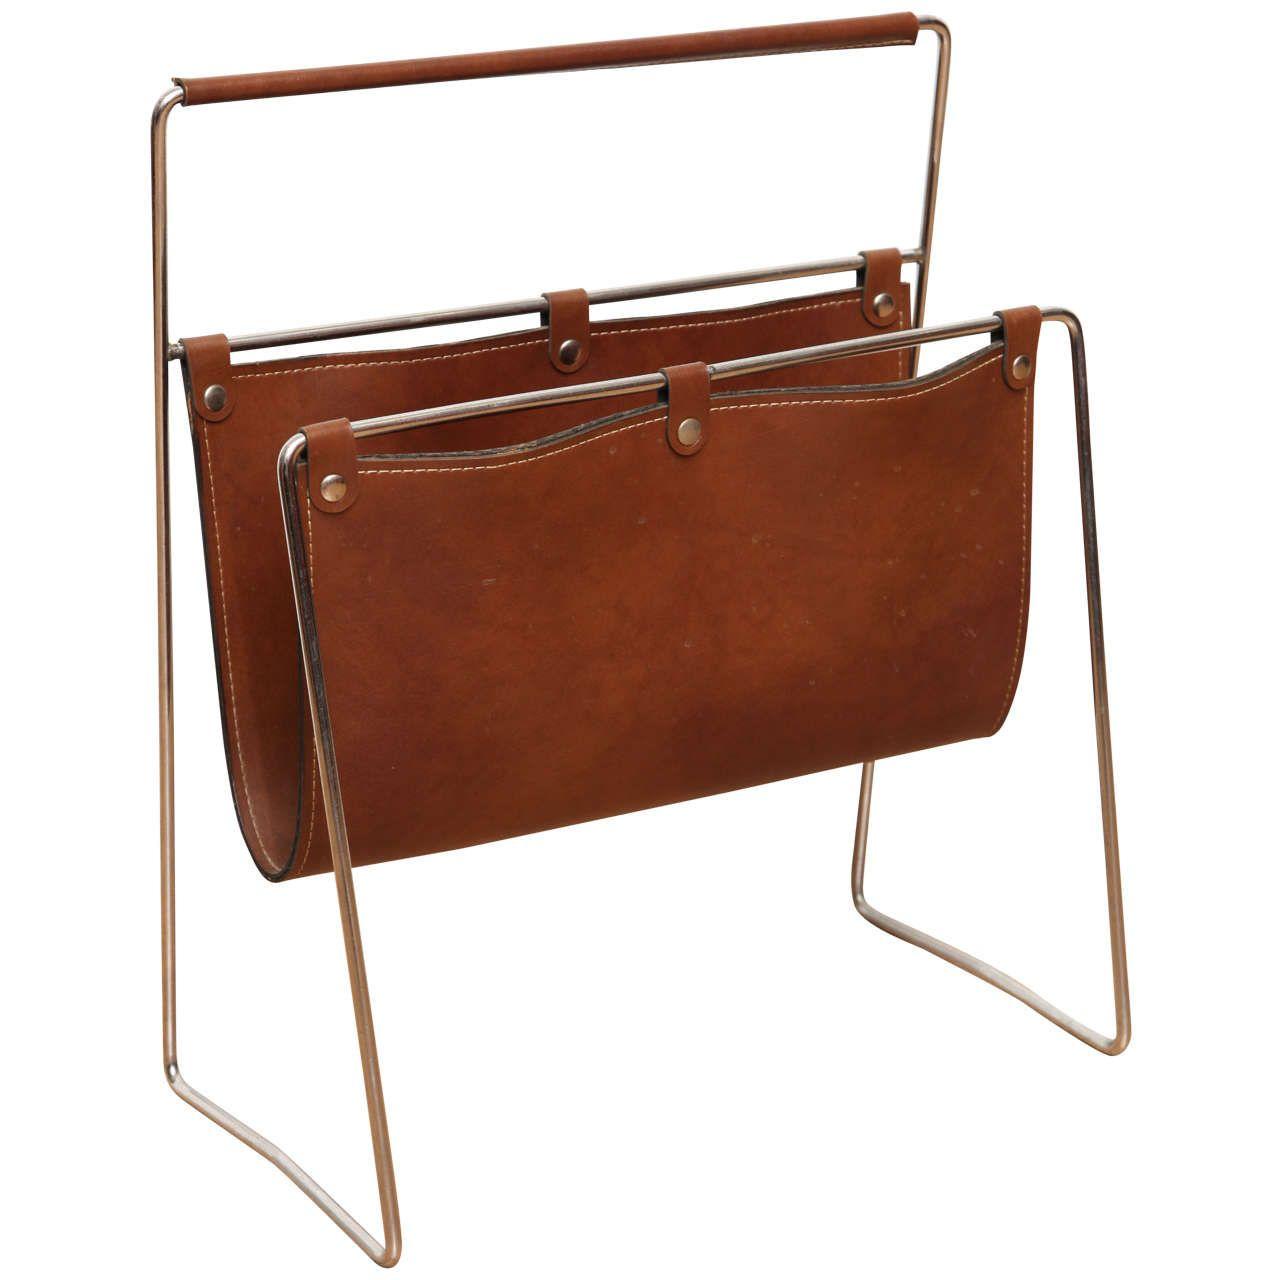 Midcentury Leather Magazine Holder   Objects of desire ...